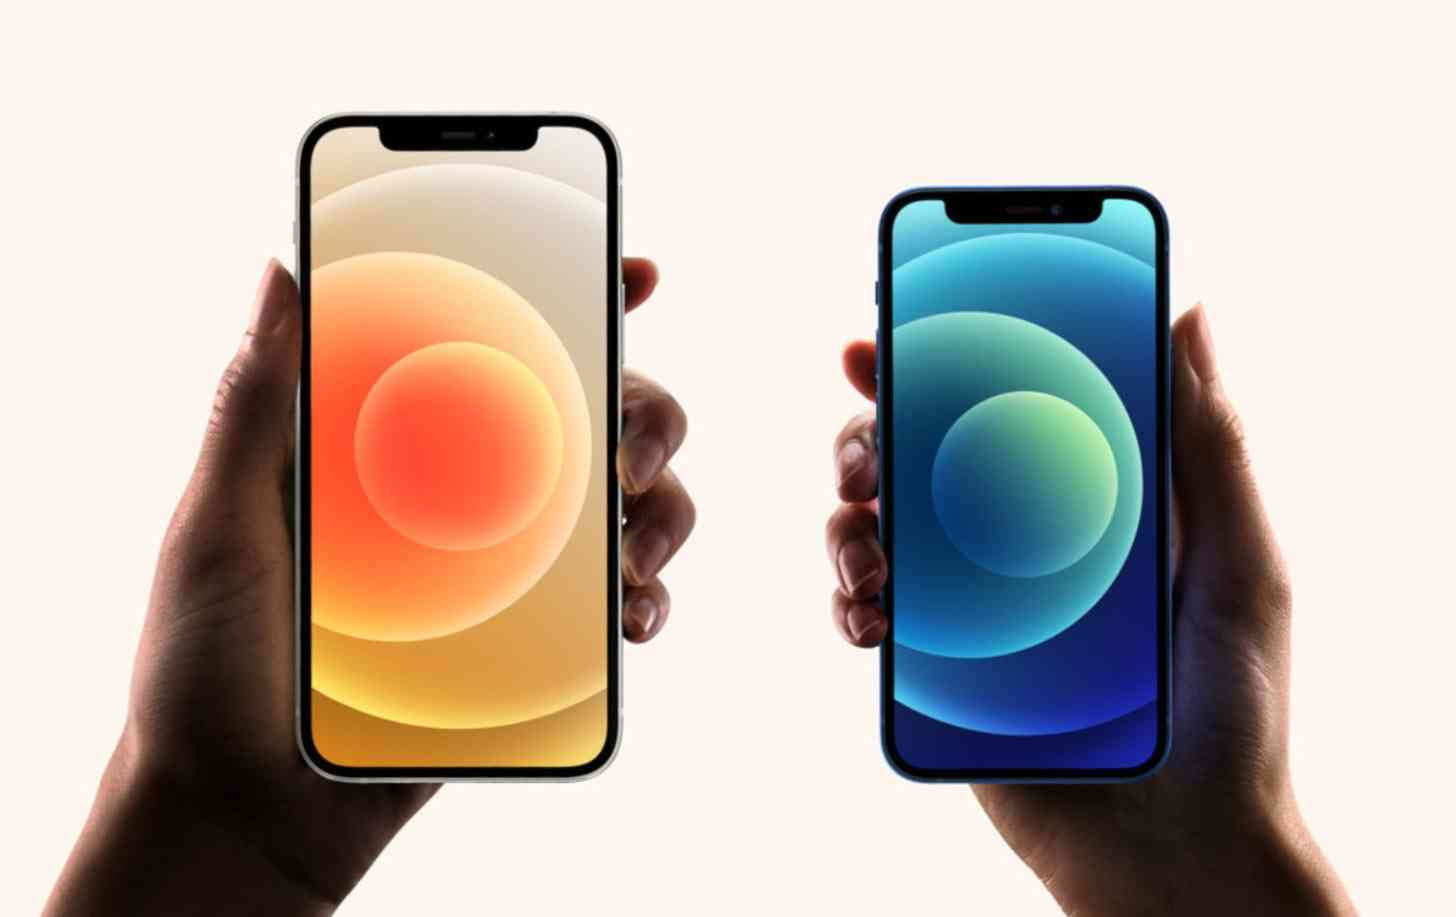 iPhone 12, iPhone 12 mini